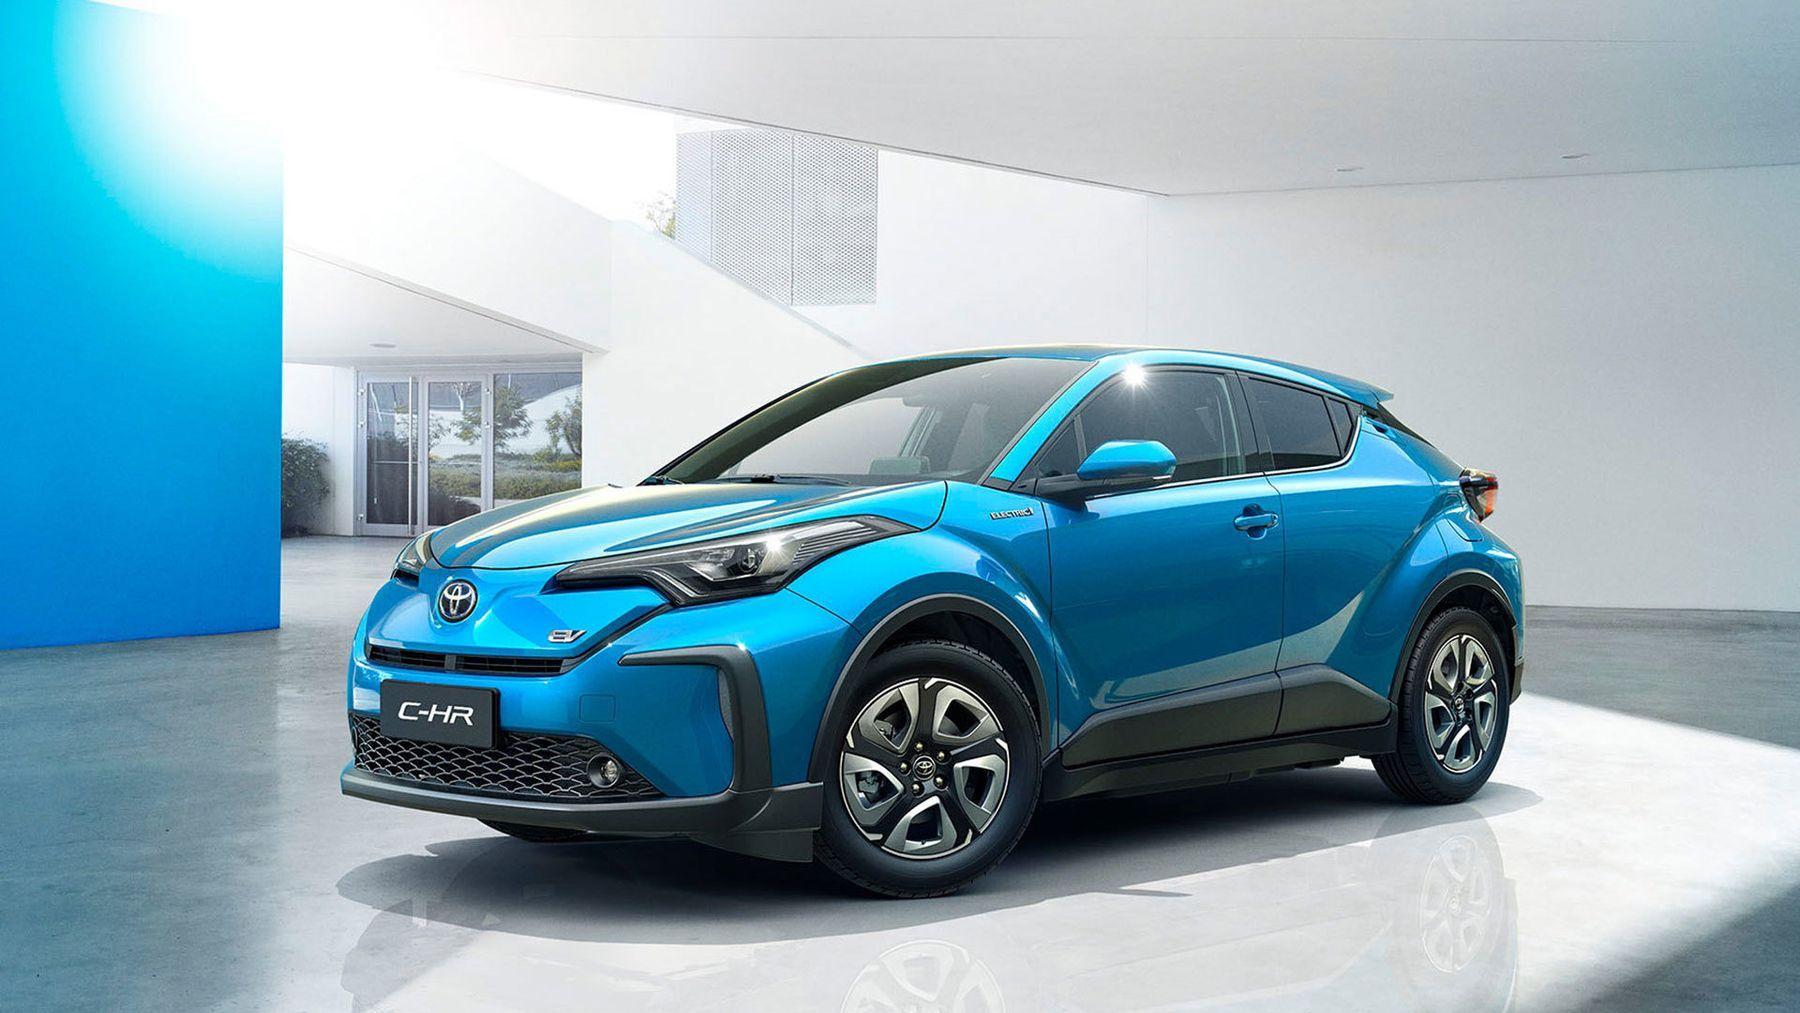 Toyota har varslet en elektrisk C-HR for Kina.